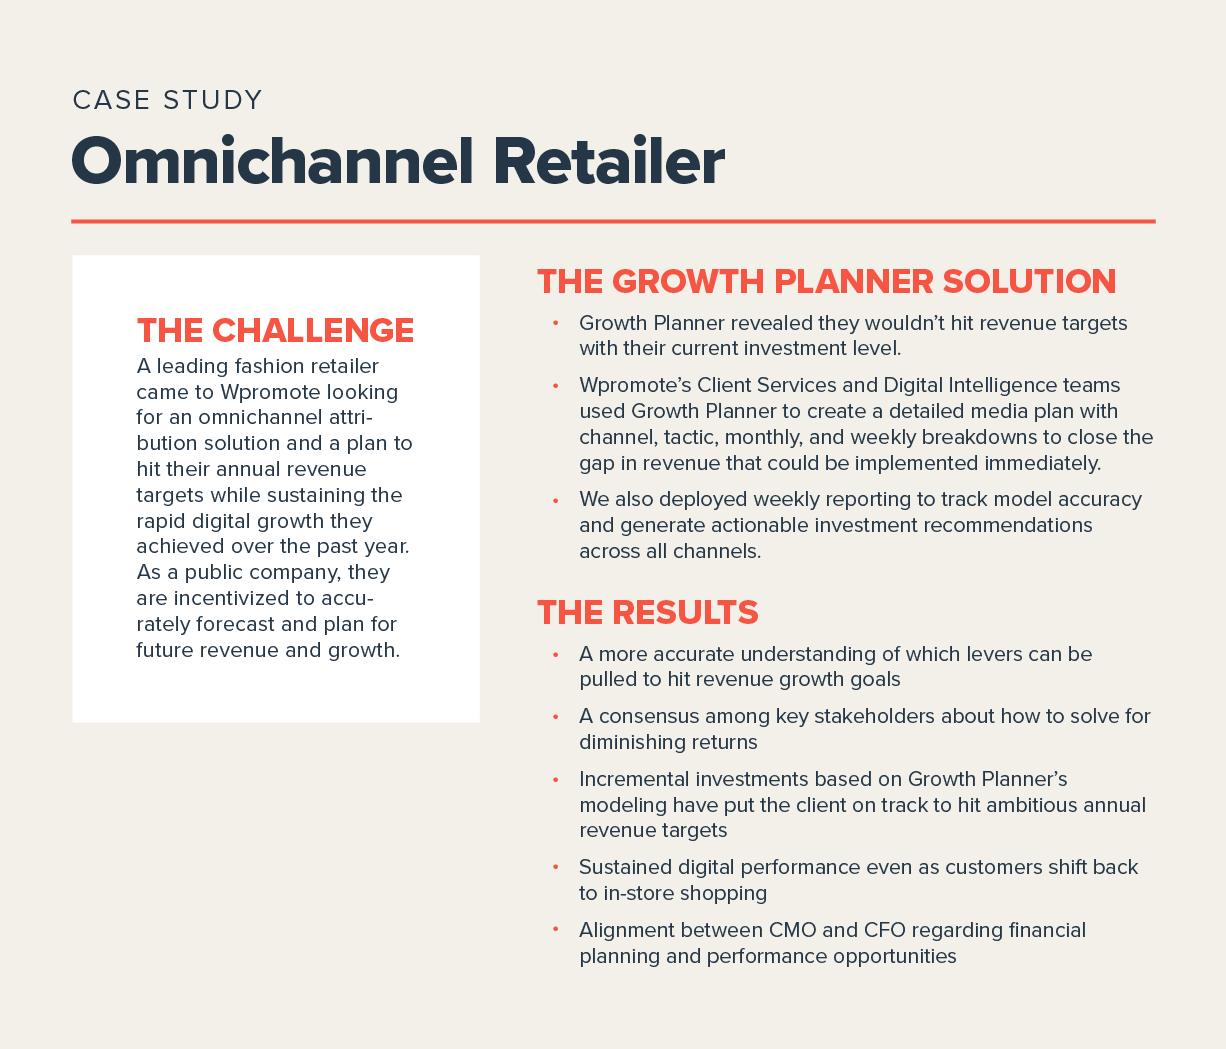 Omnichannel retail case study about Growth Planner in Polaris